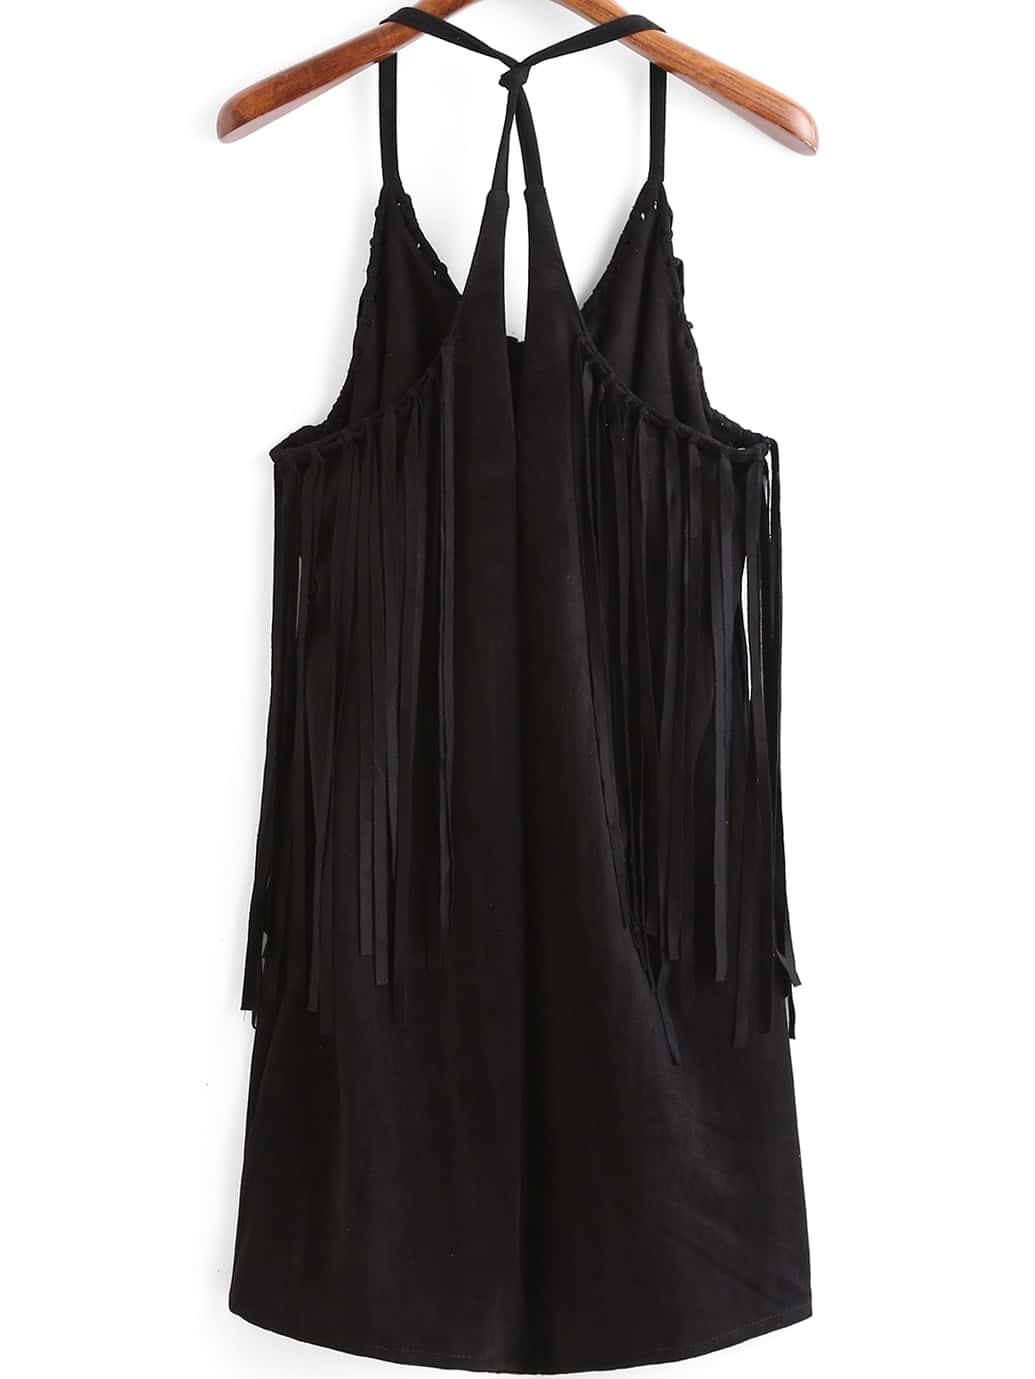 robe franges bretelle noir french shein sheinside. Black Bedroom Furniture Sets. Home Design Ideas